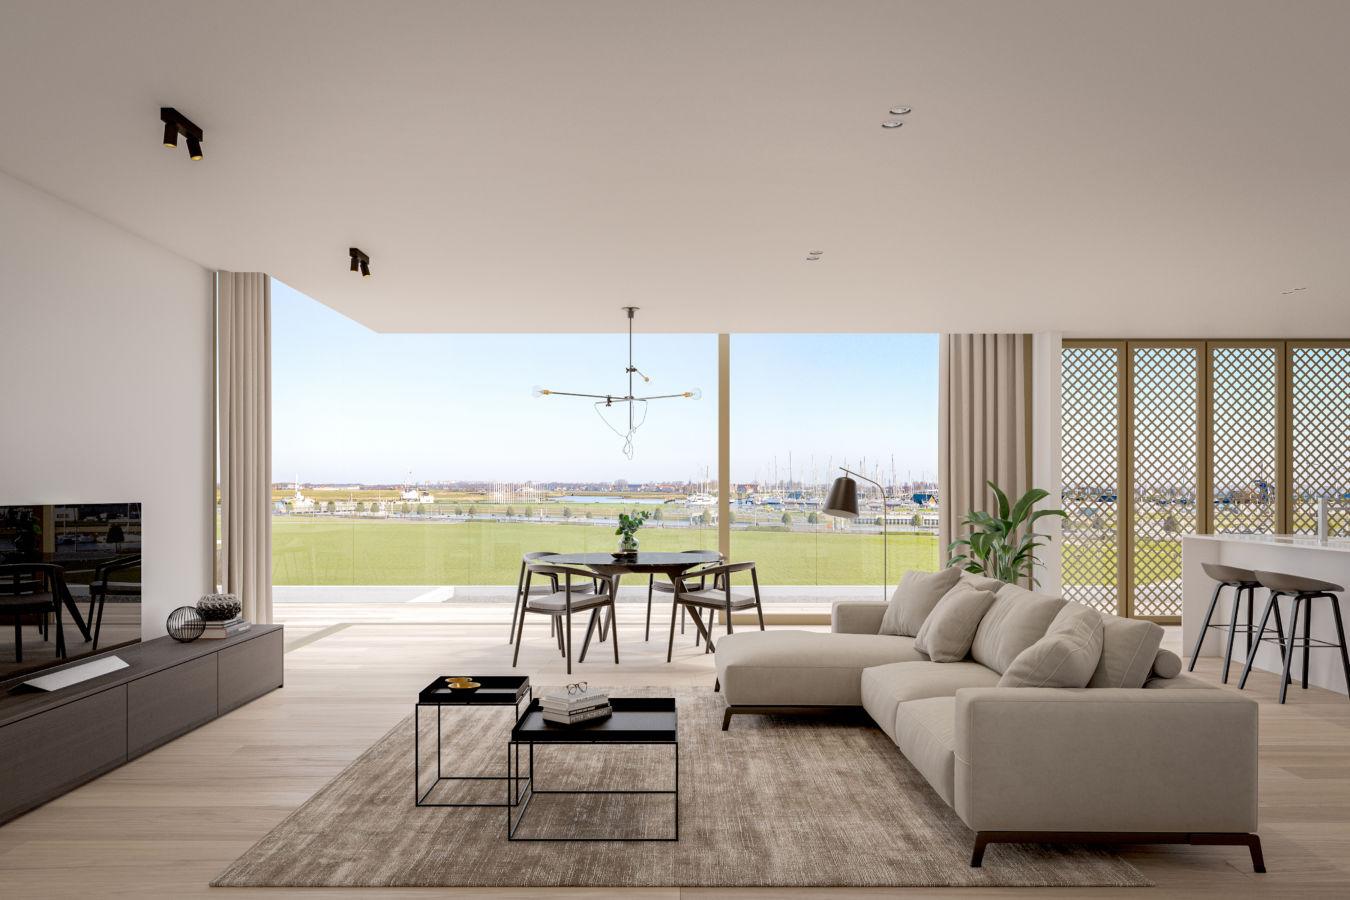 BV594 int penthouse 2020.07.16_sRGB